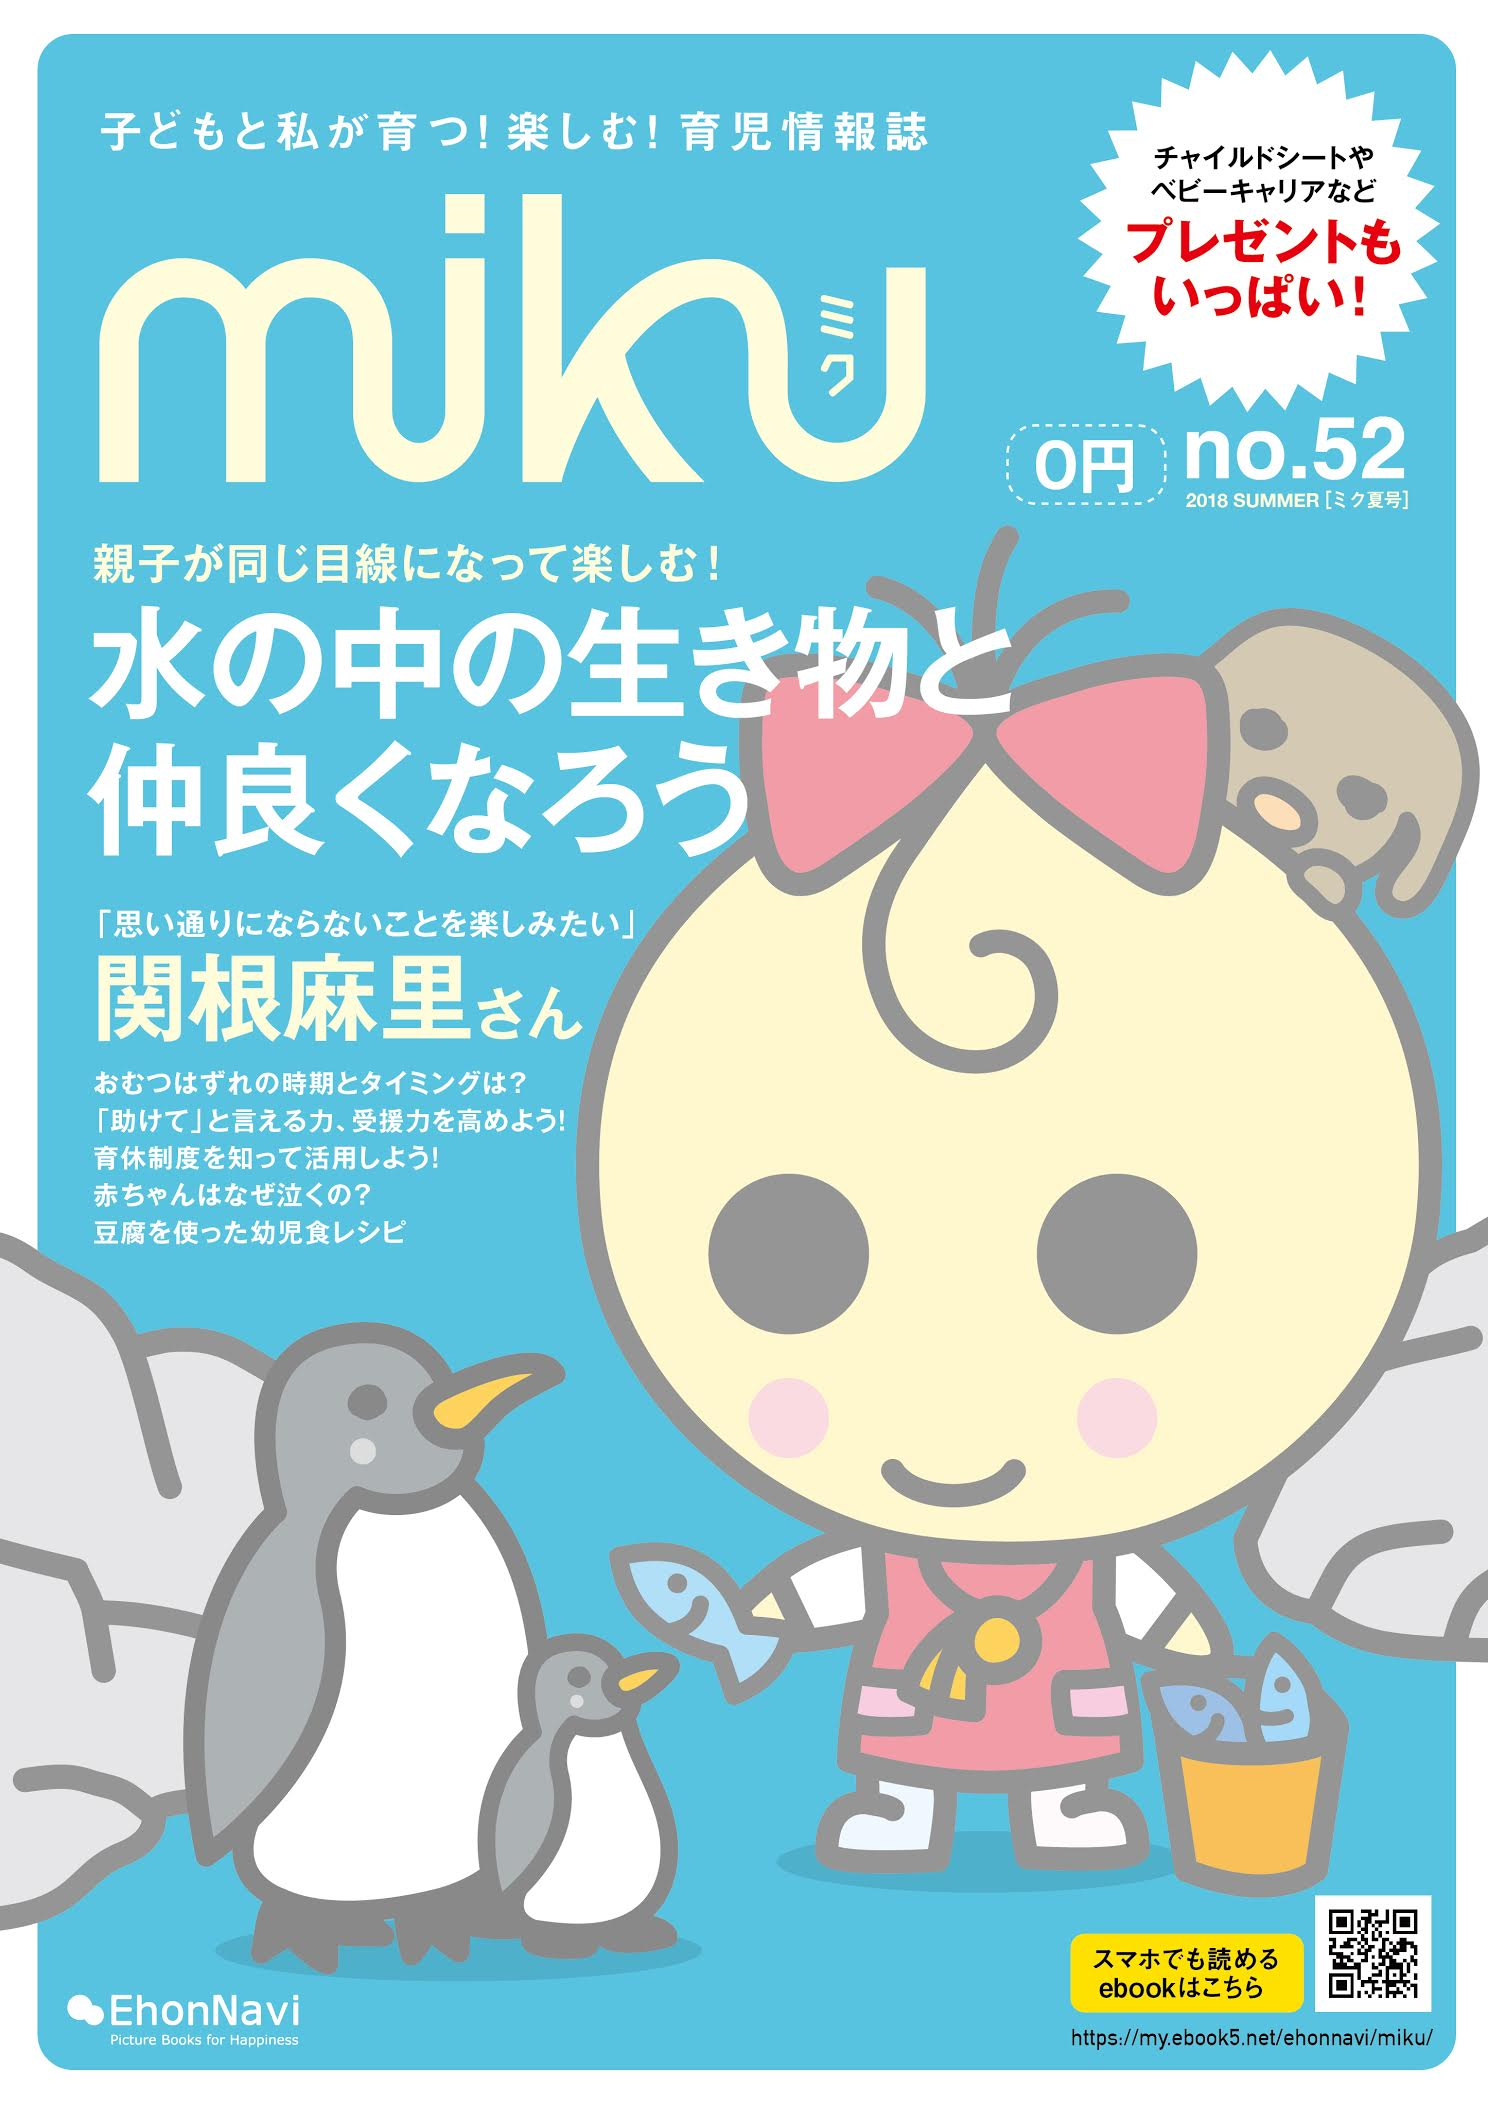 https://my.ebook5.net/ehonnavi/miku/?_ga=stylebacknumber